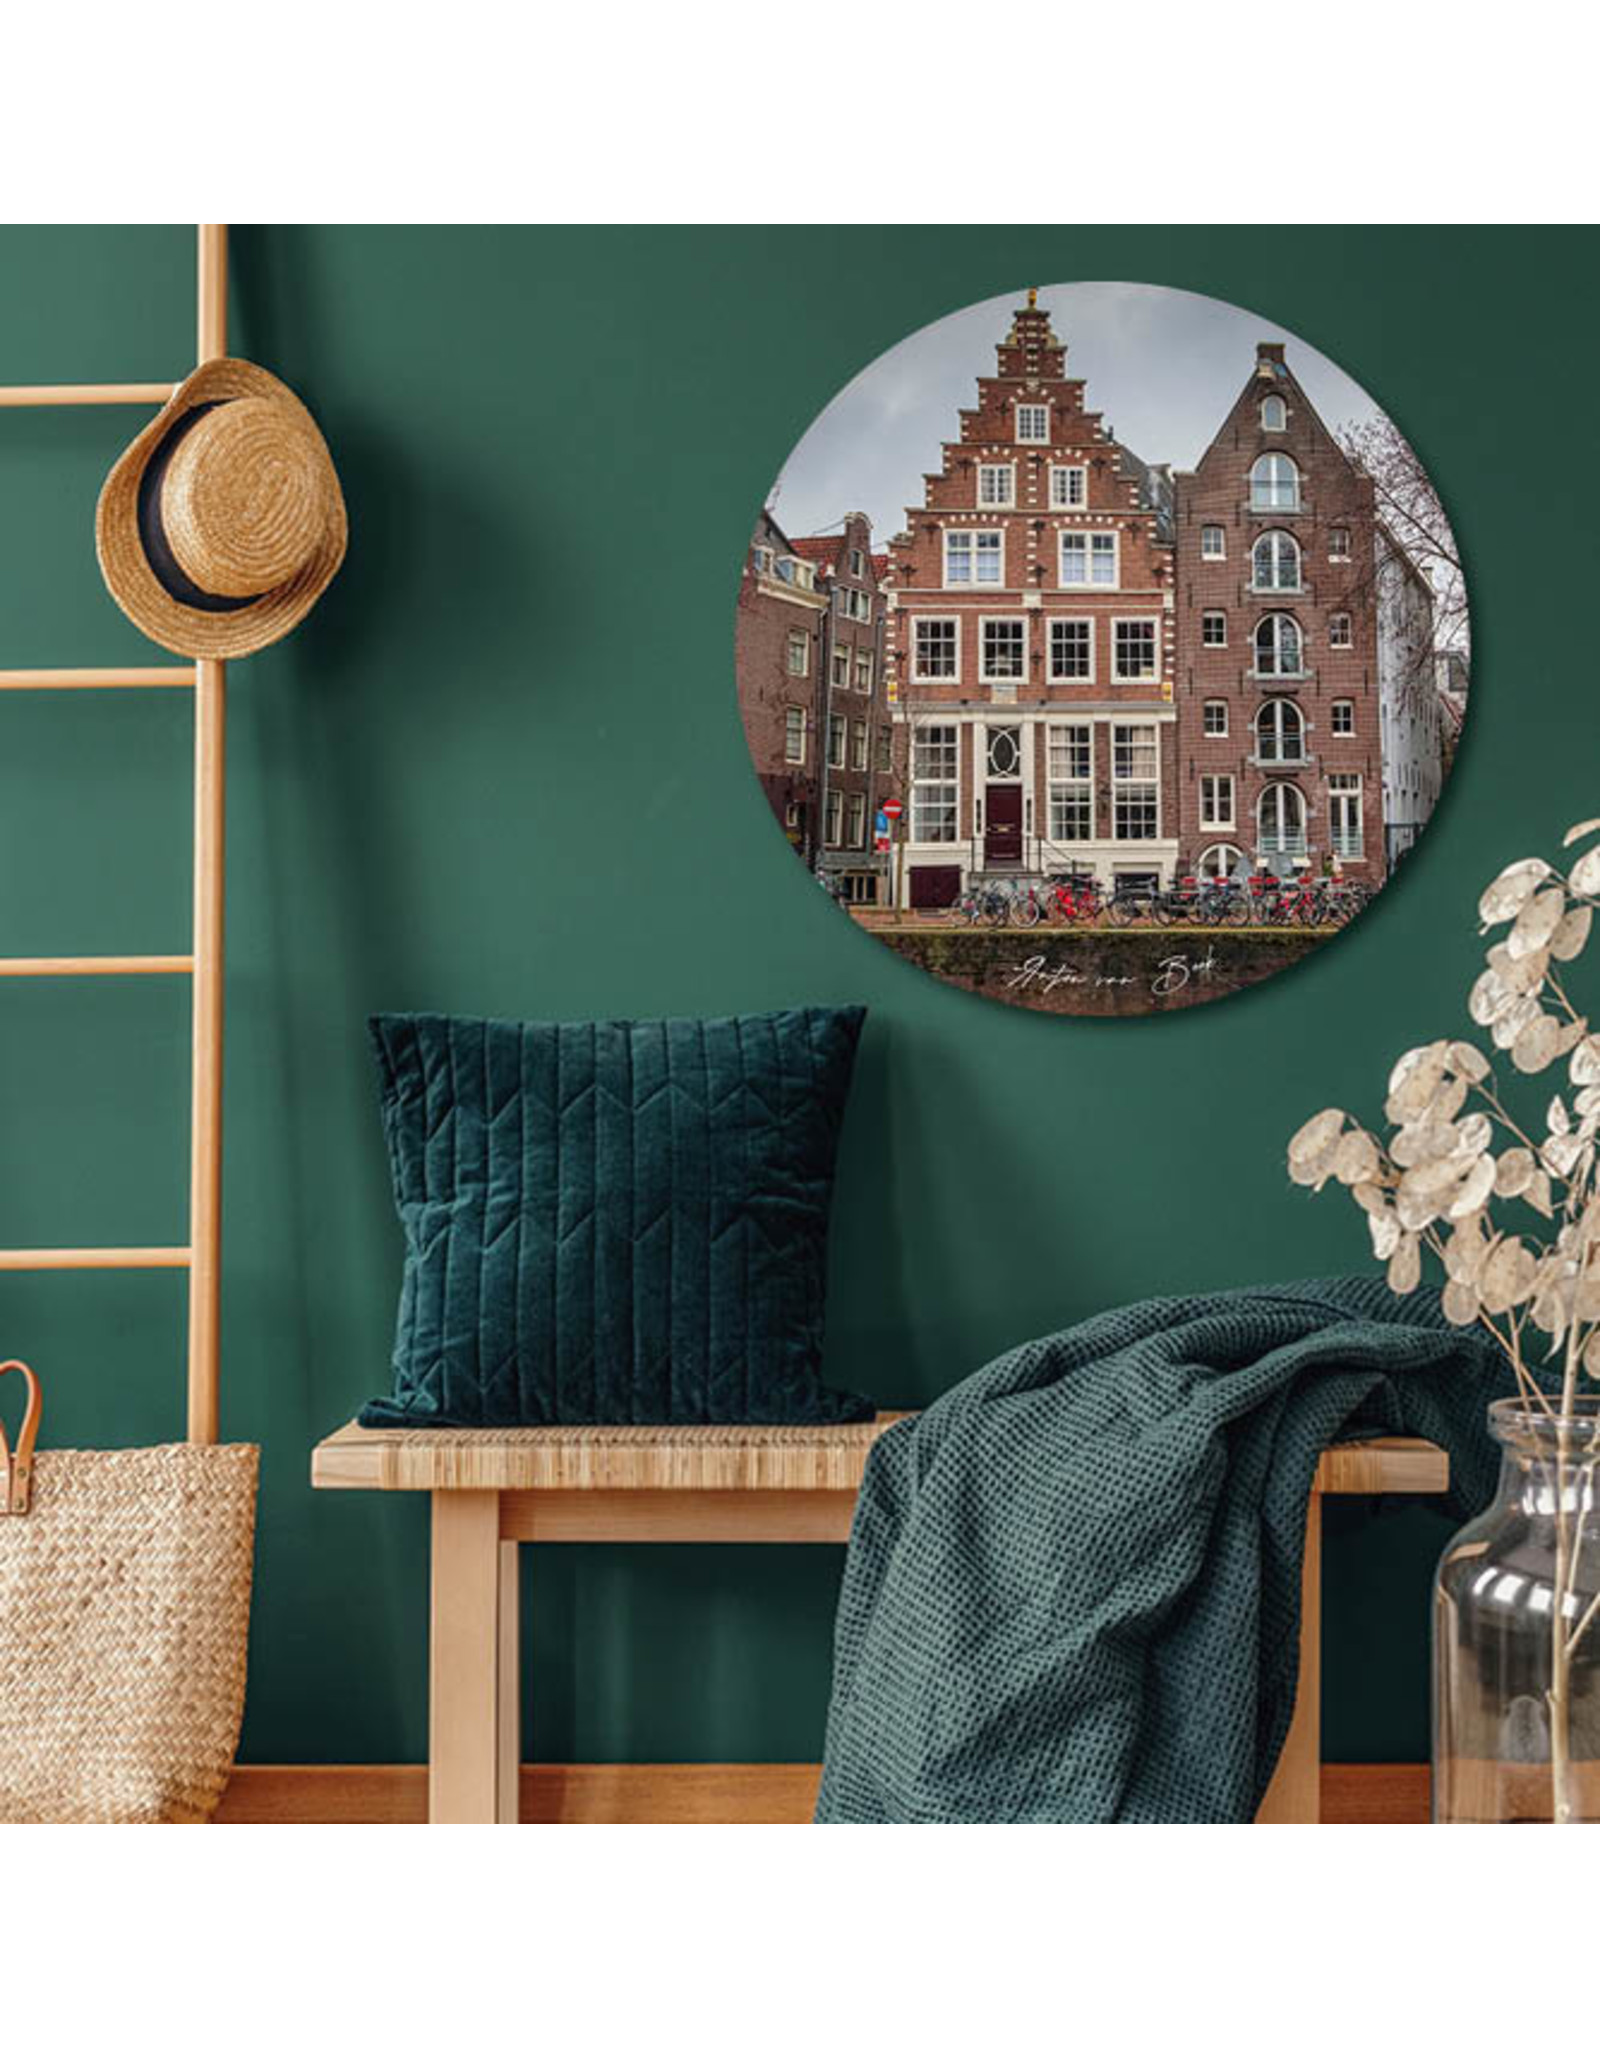 Dunnebier Home Muursticker Amsterdam_2 - verwijderbaar